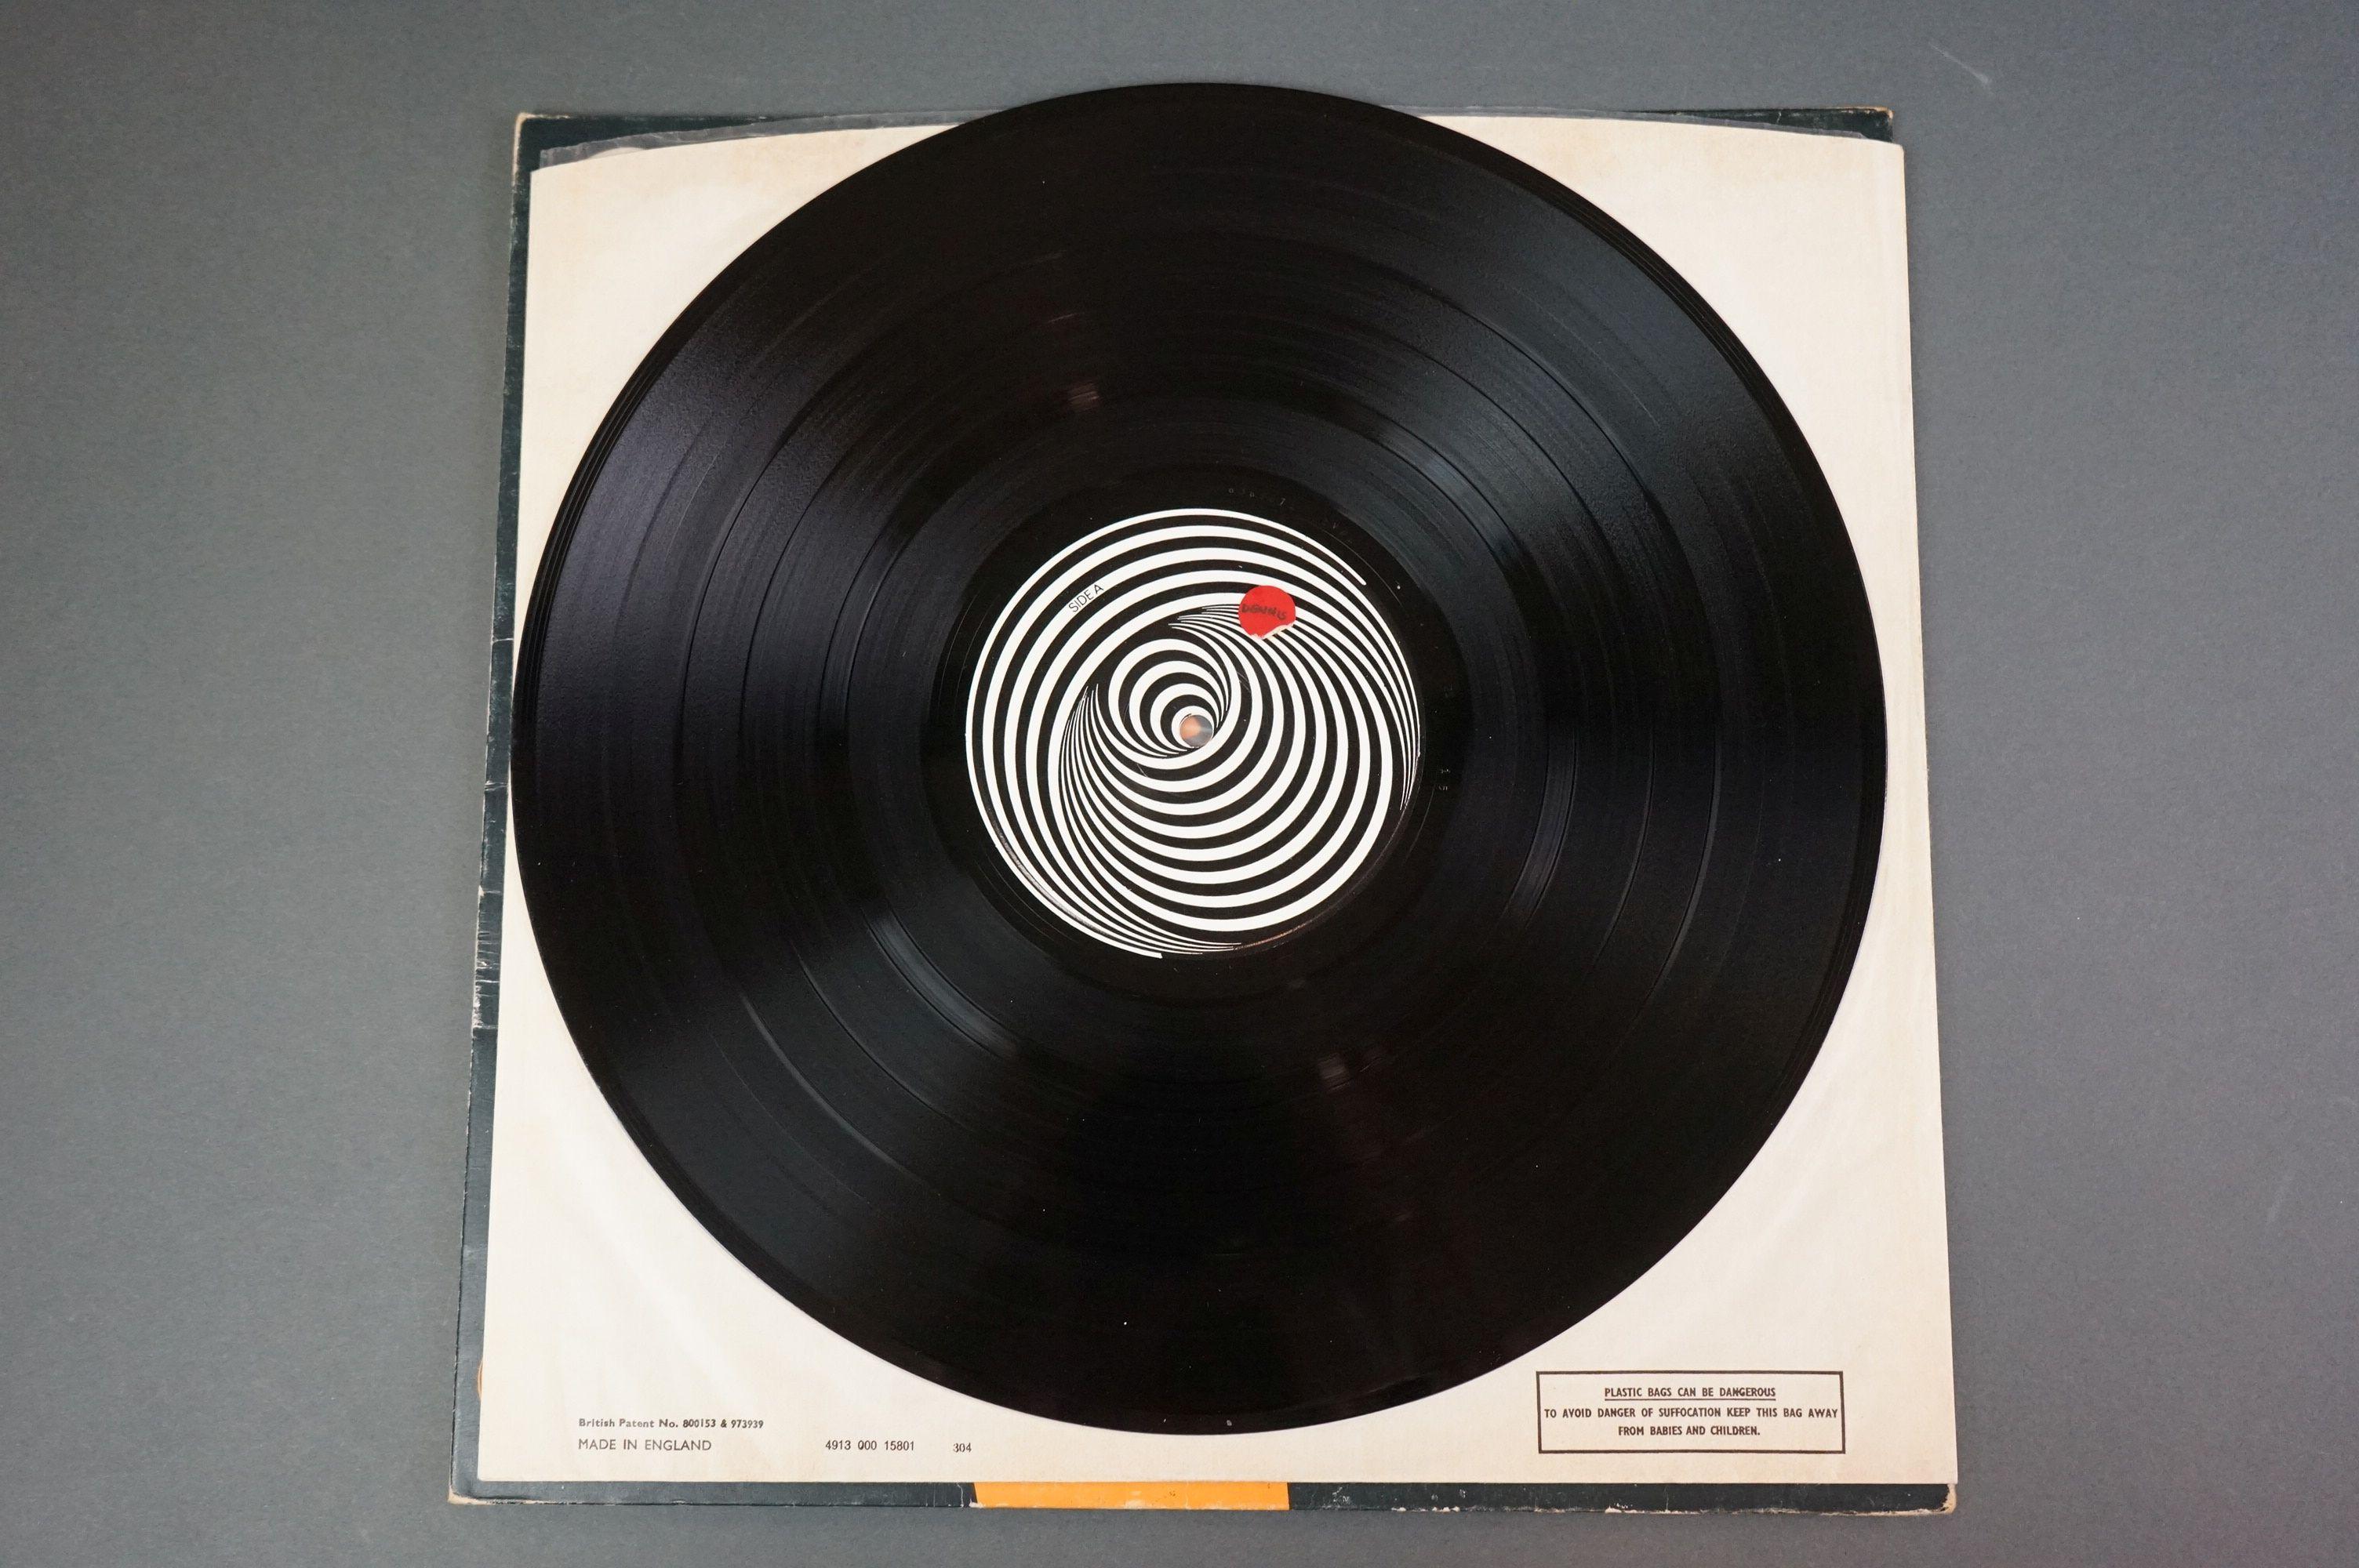 Vinyl - Black Sabbath vol 4 6360071 on Vertigo 1st pressing, no 'made in England' to label, gatefold - Image 4 of 6